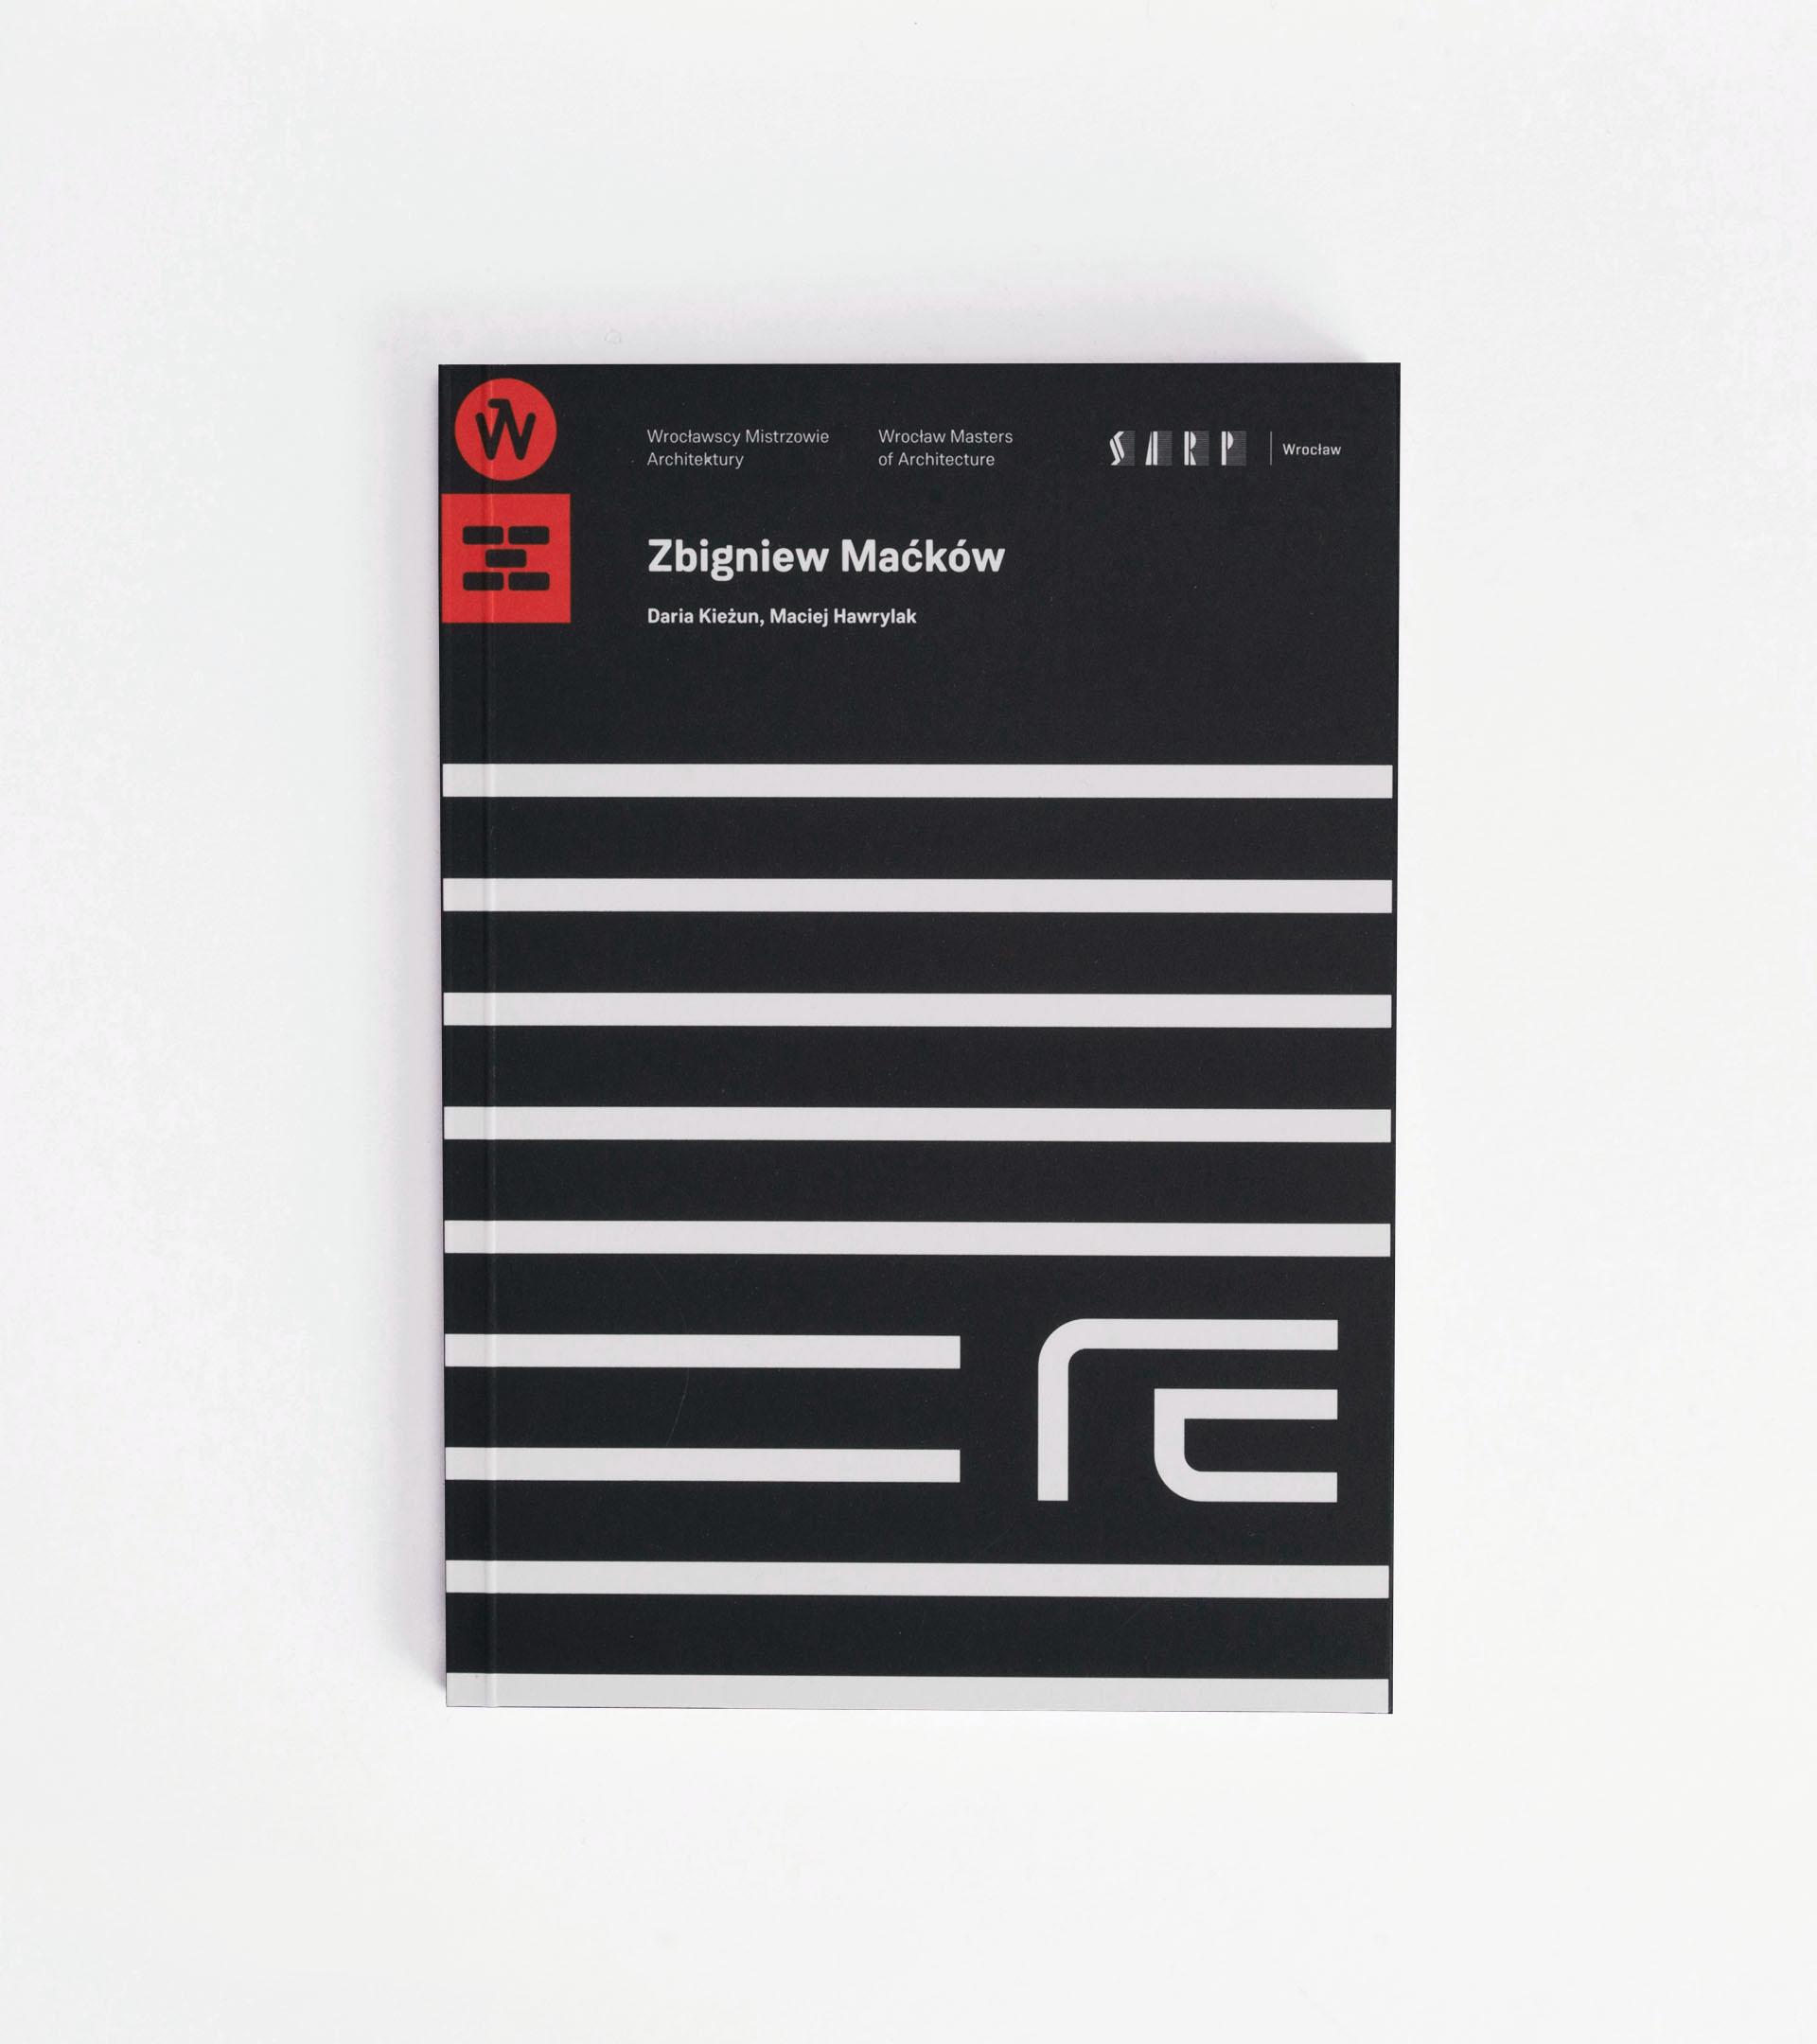 WMA - The Codeine Design